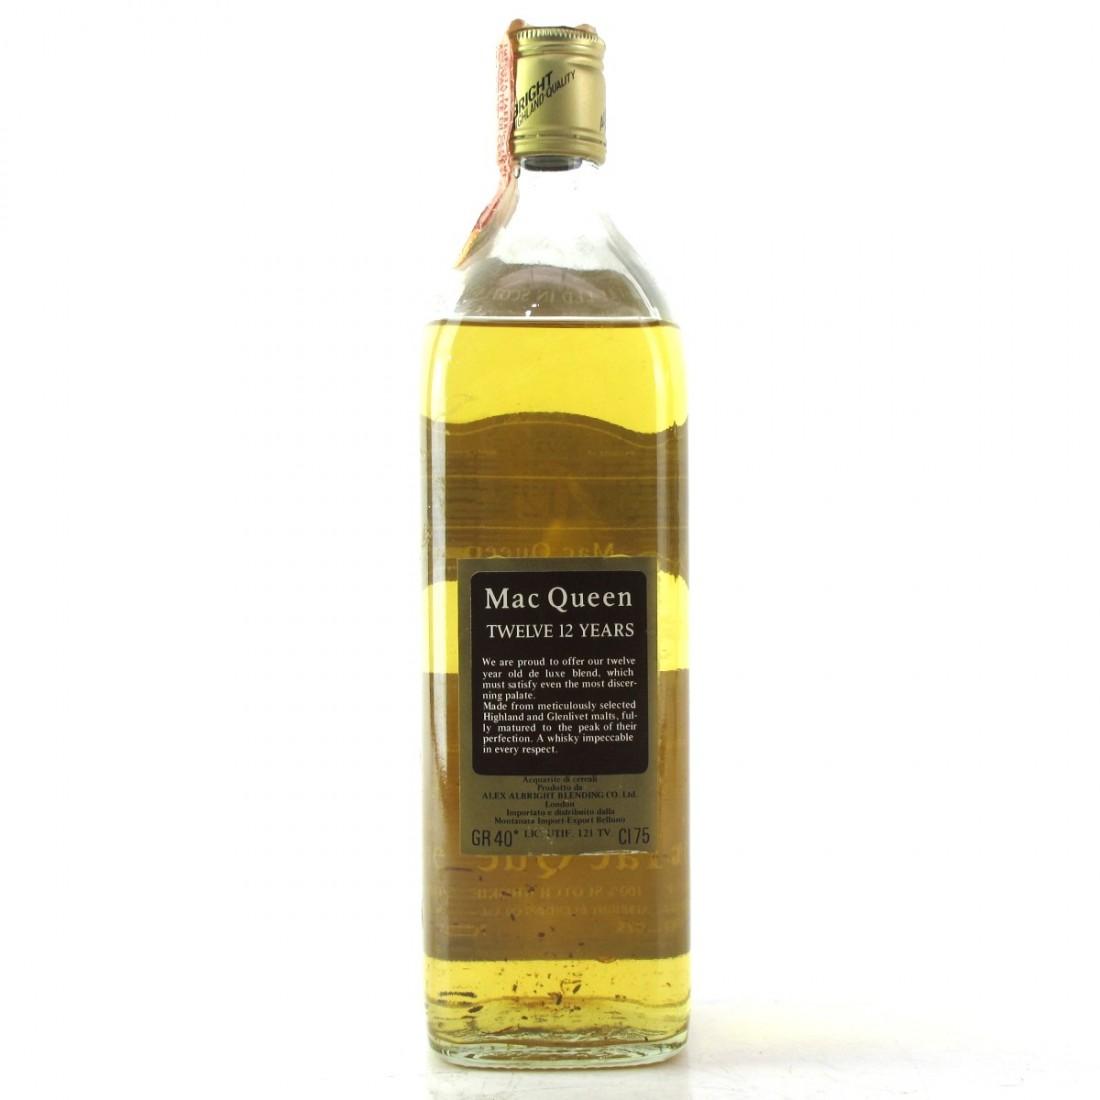 Mac Queen 12 Year Old Scotch 1970s